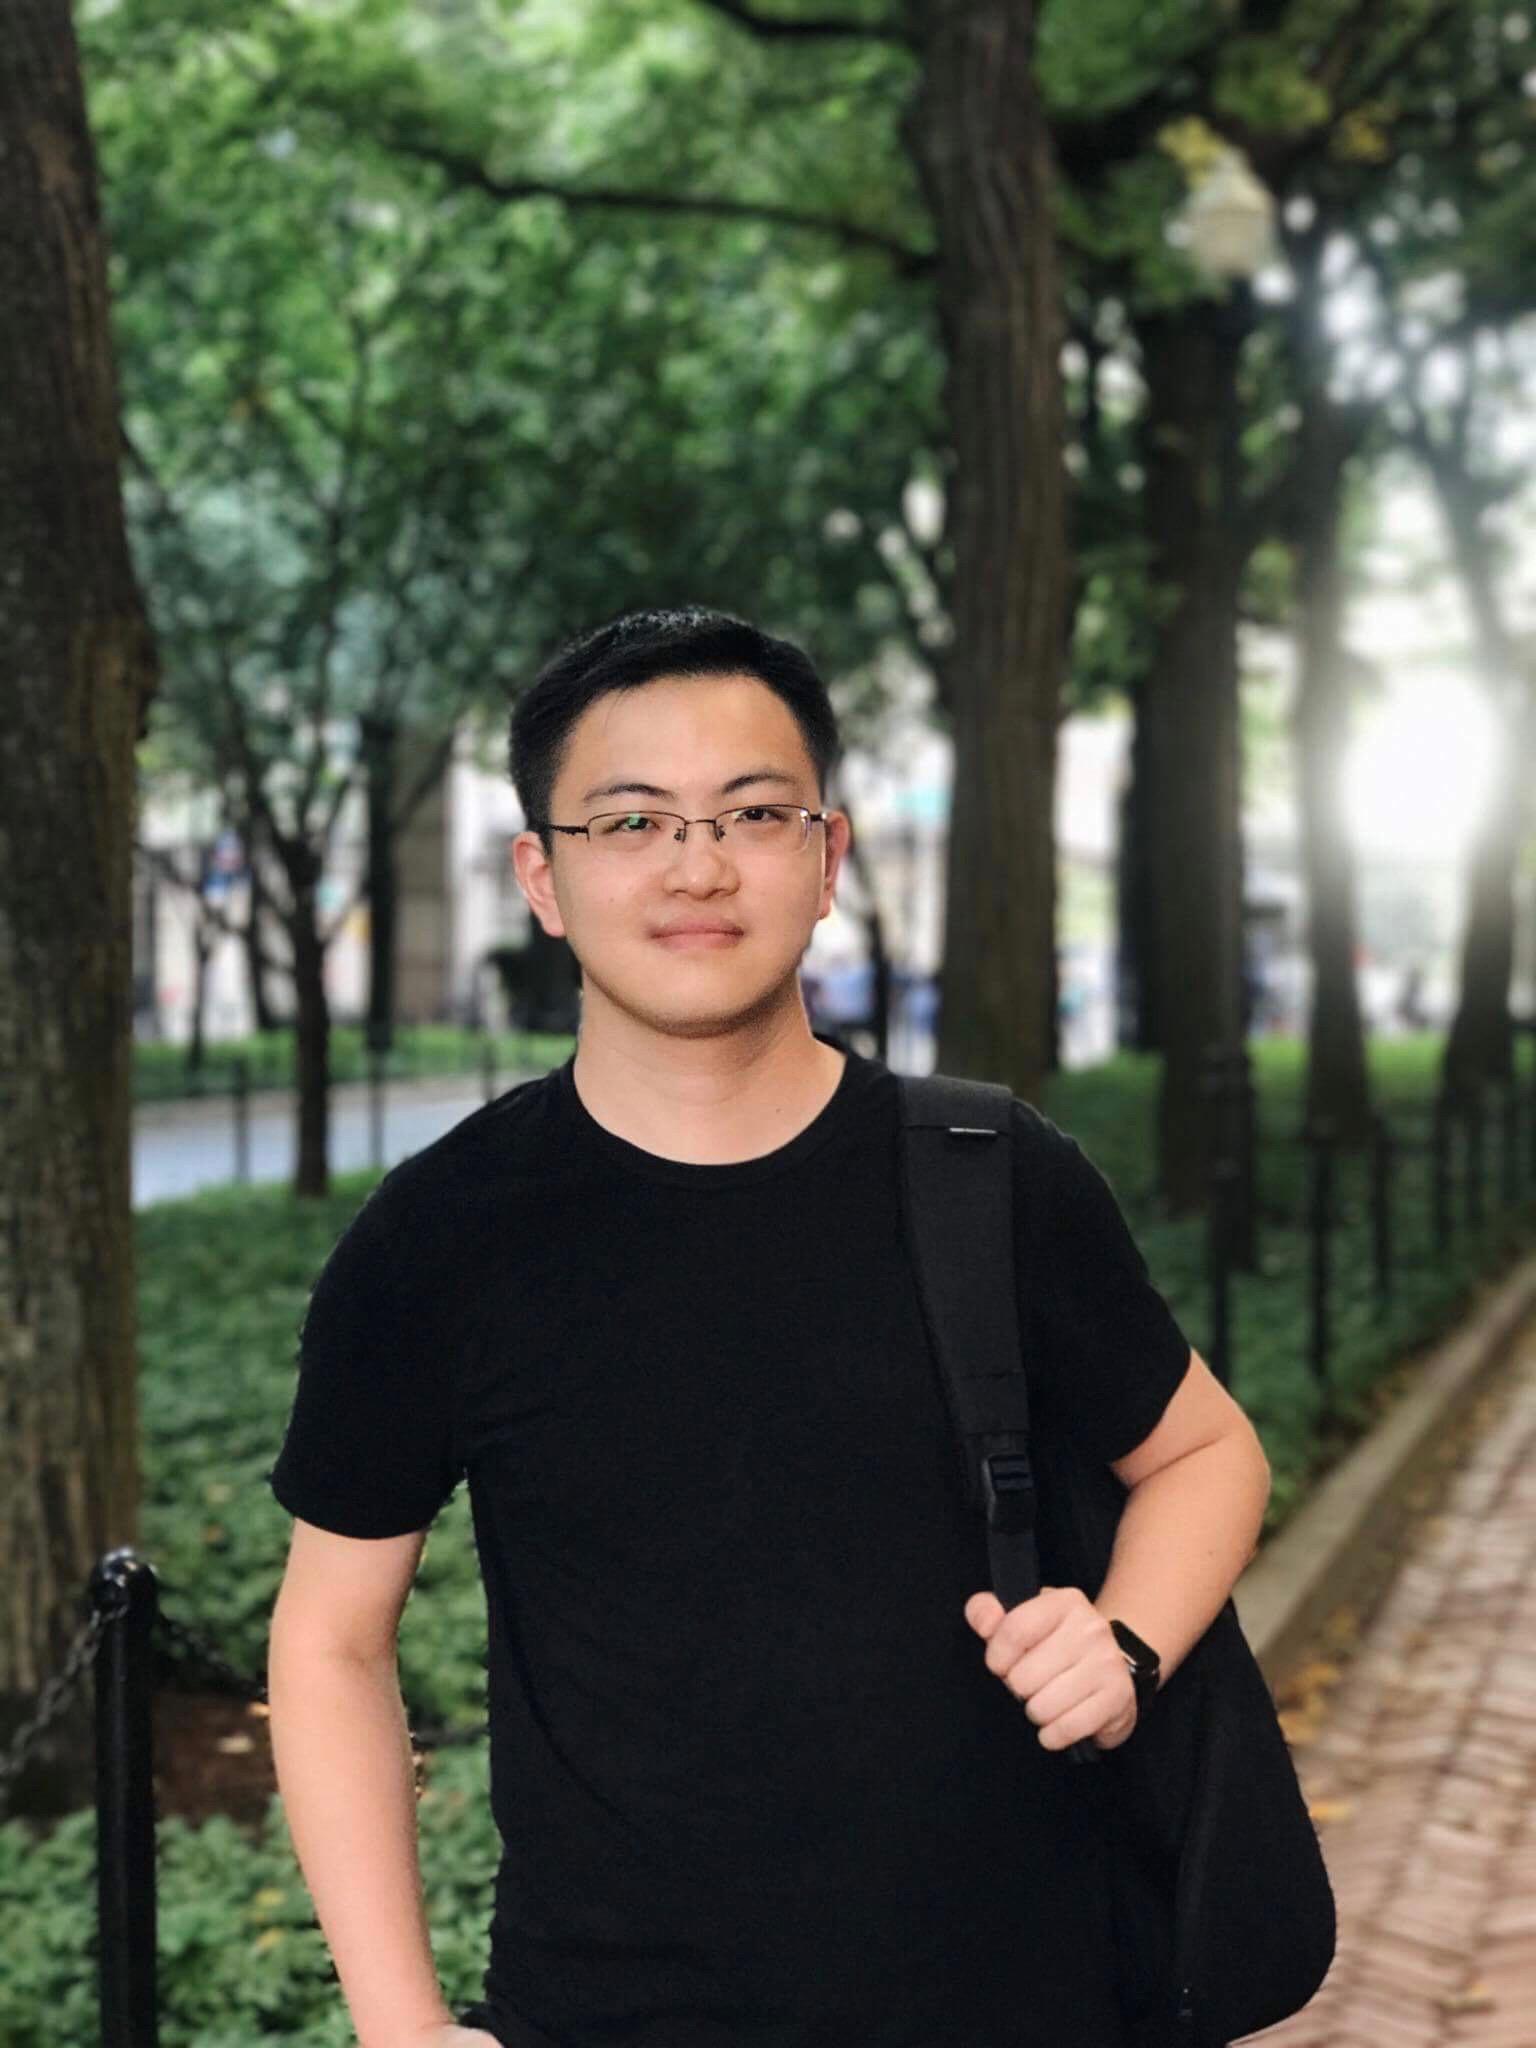 Johnew Zhang